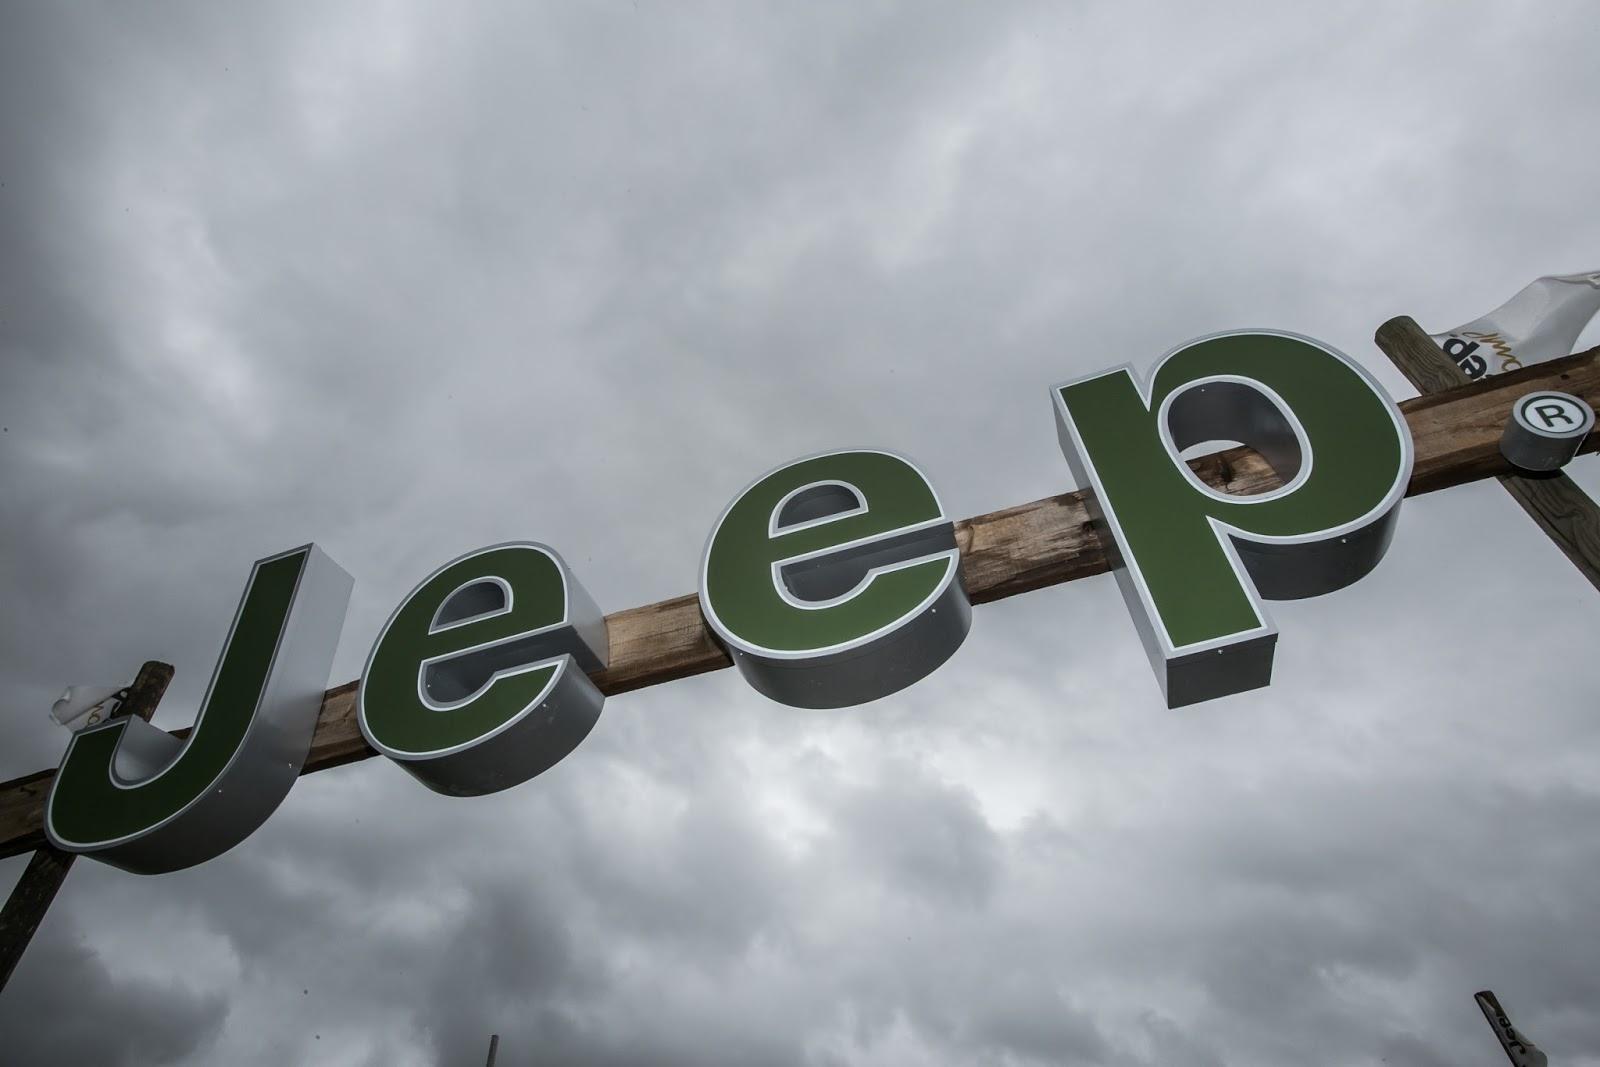 JEEP%2BCAMP GK 0382 Πετάμε ένα Jeep Renegade σε λάσπες, πέτρες, άμμο, λίμνες. Θα τα καταφέρει;